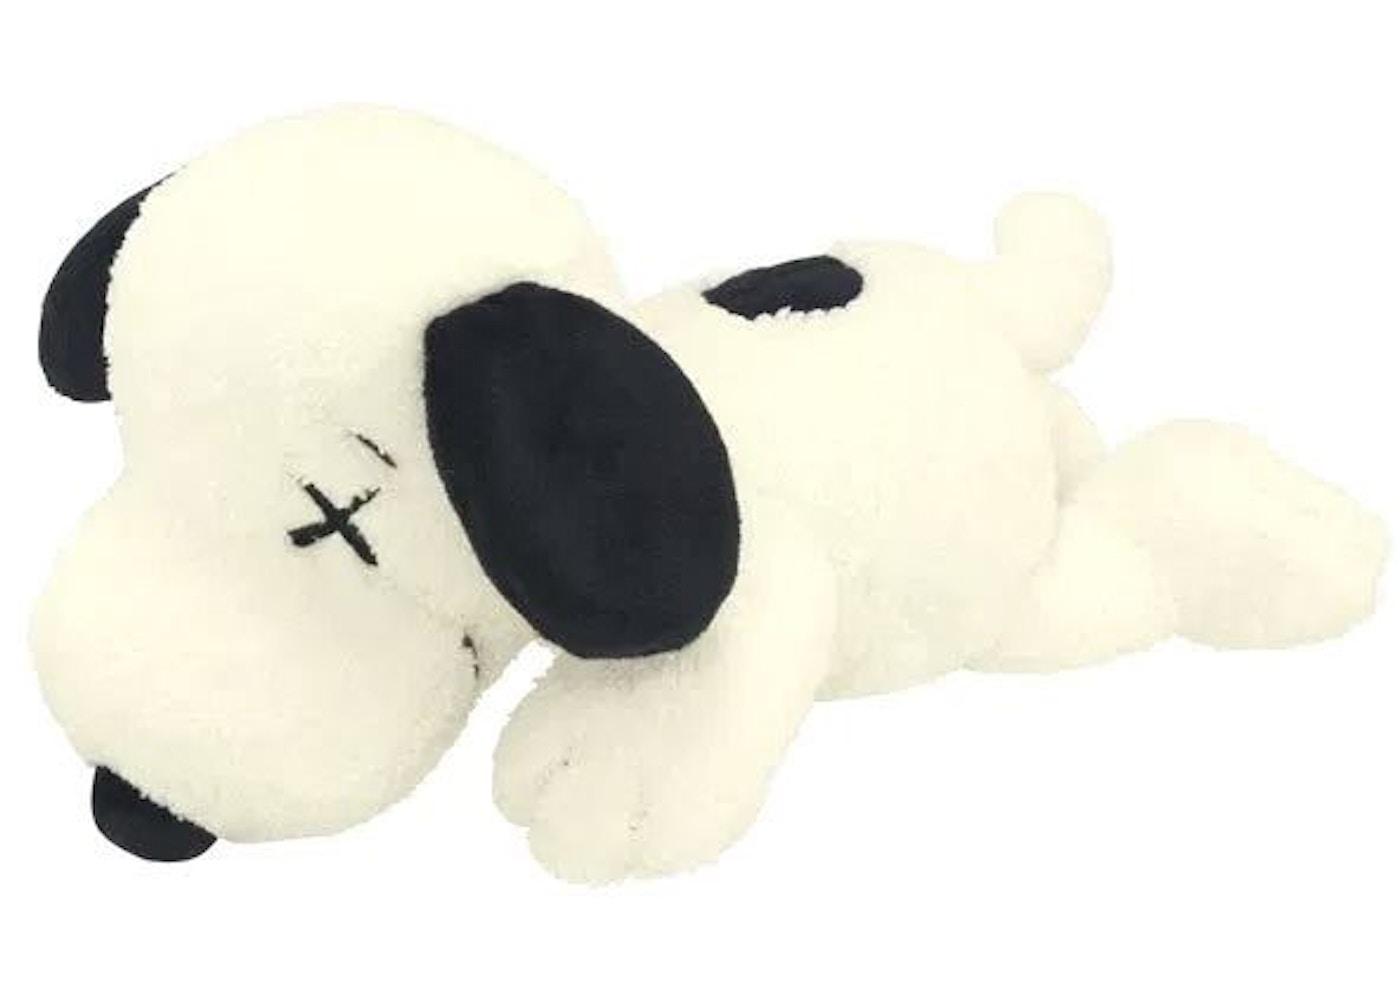 102139a803 Kaws x Uniqlo x Peanuts Snoopy Plush (Small) White - SS17